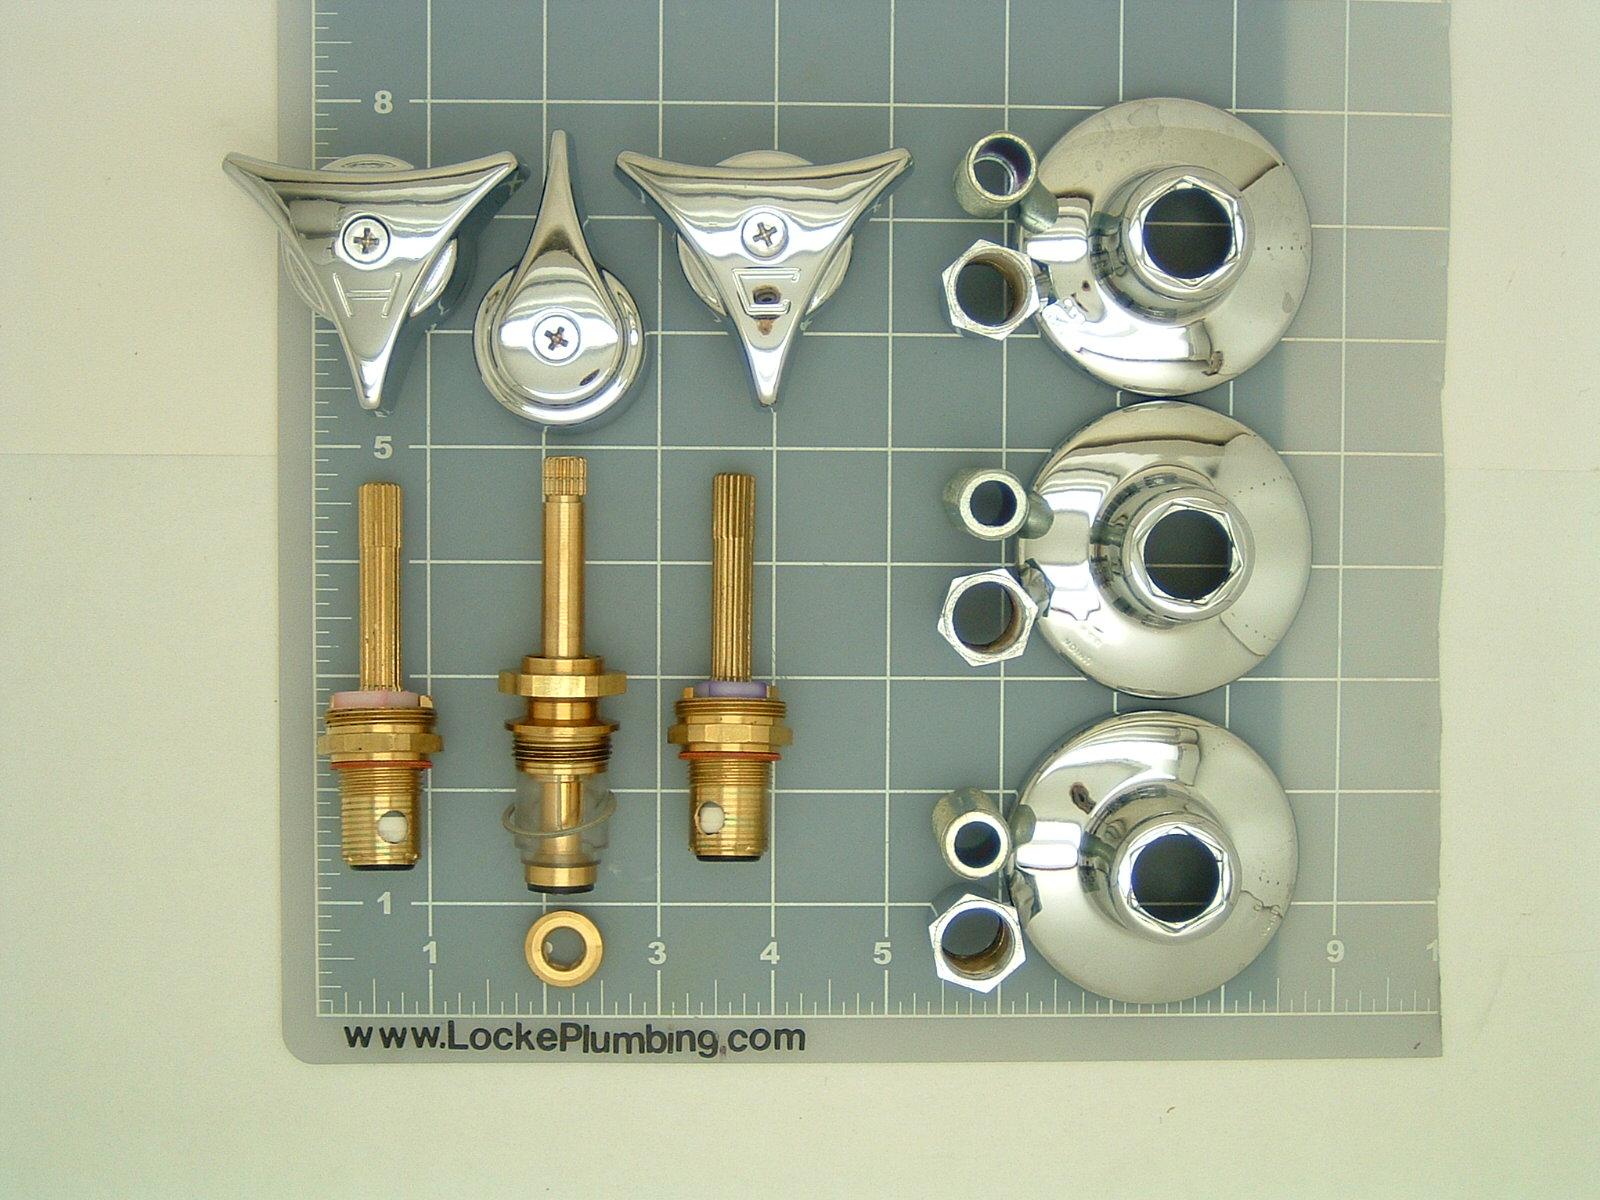 Union Brass Faucet Rebuild Kit With Ceramic Stems Locke